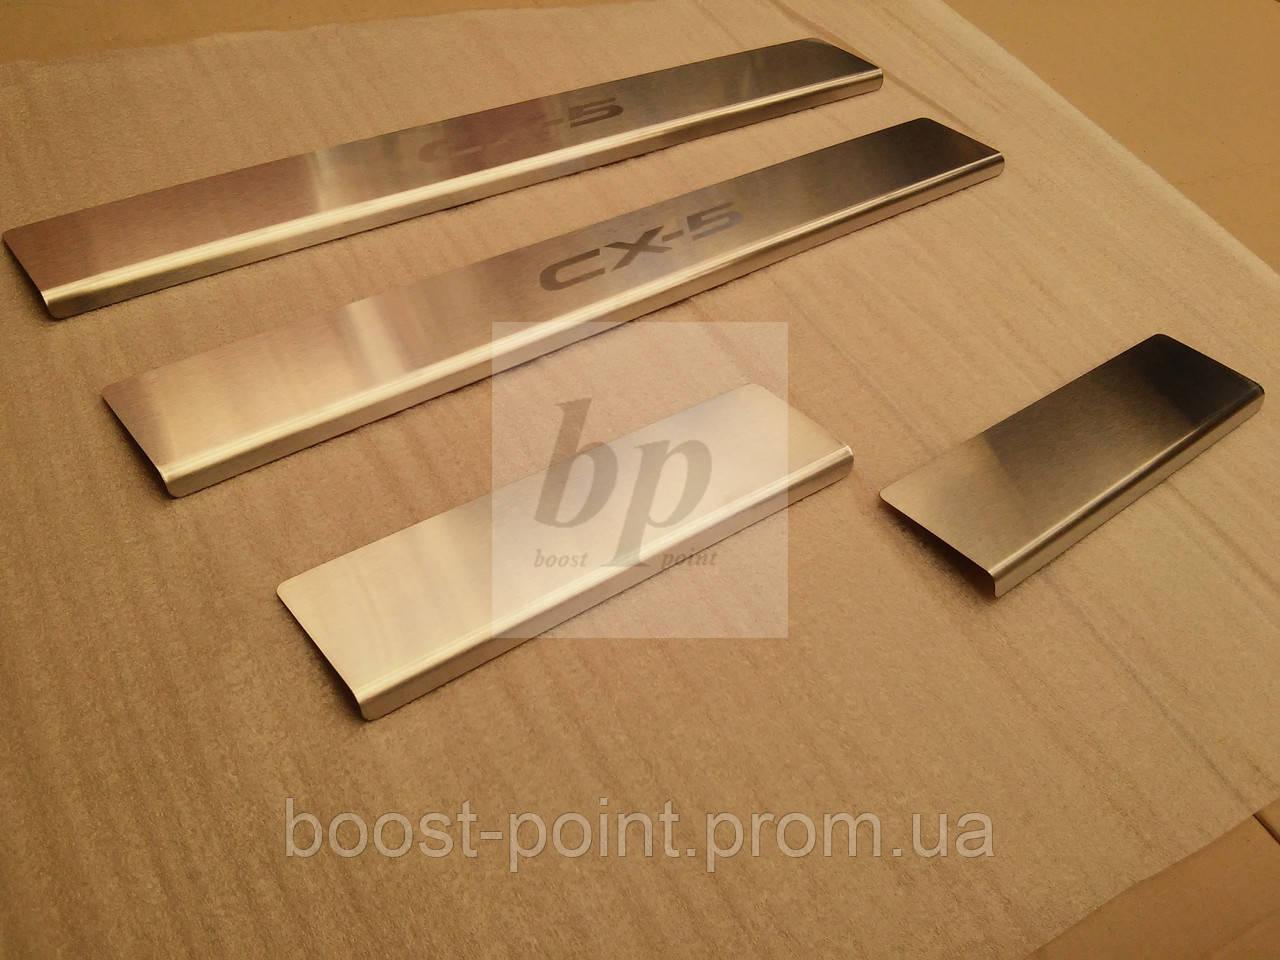 Защитные хром накладки на пороги Mazda cx-5 (мазда сх-5) 2012+, фото 1